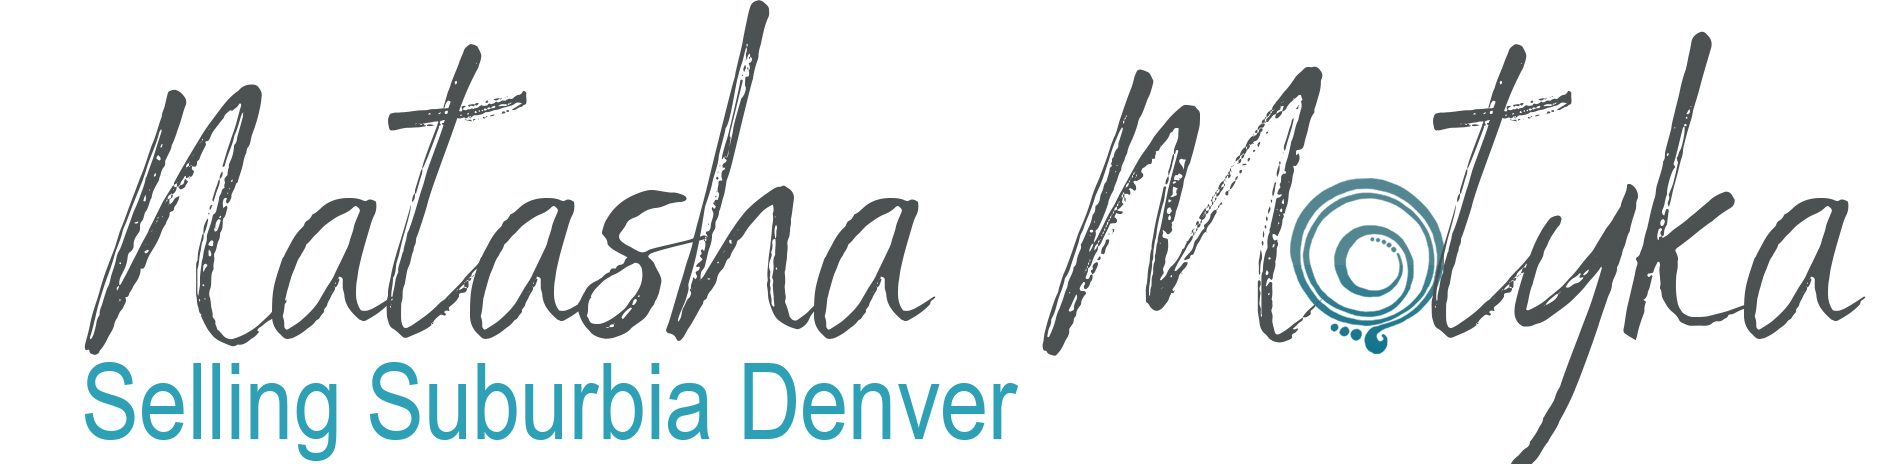 Selling Suburbia Denver